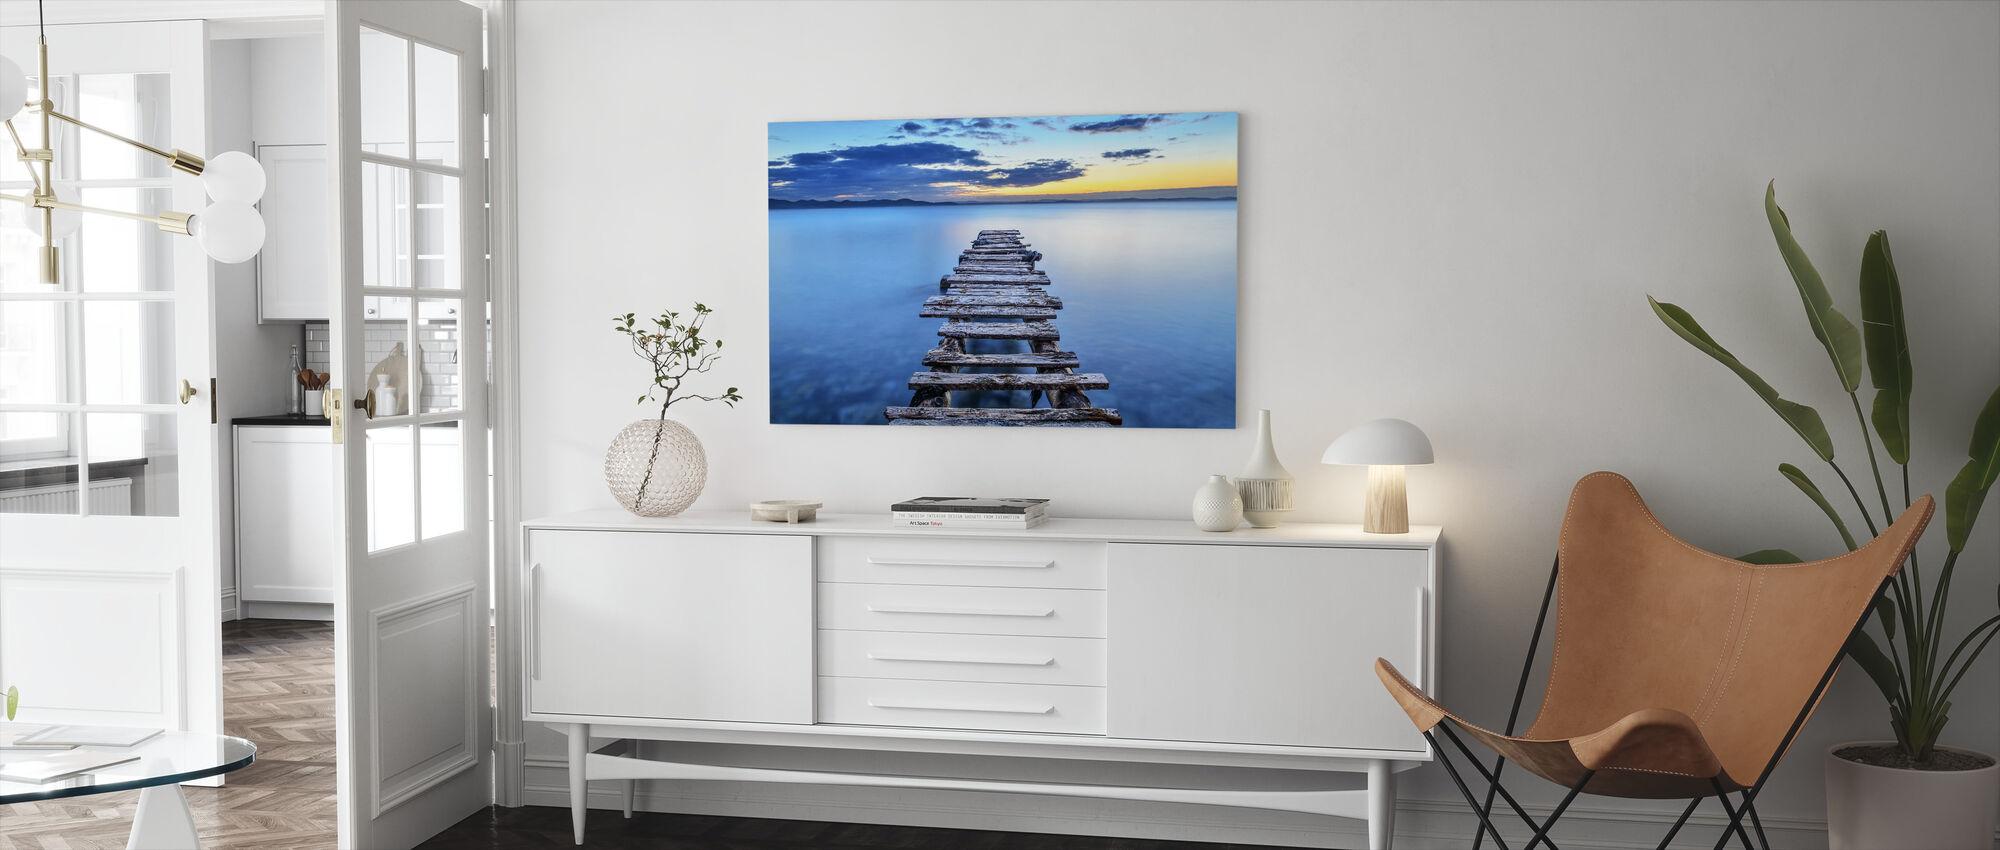 Pier - Canvas print - Living Room